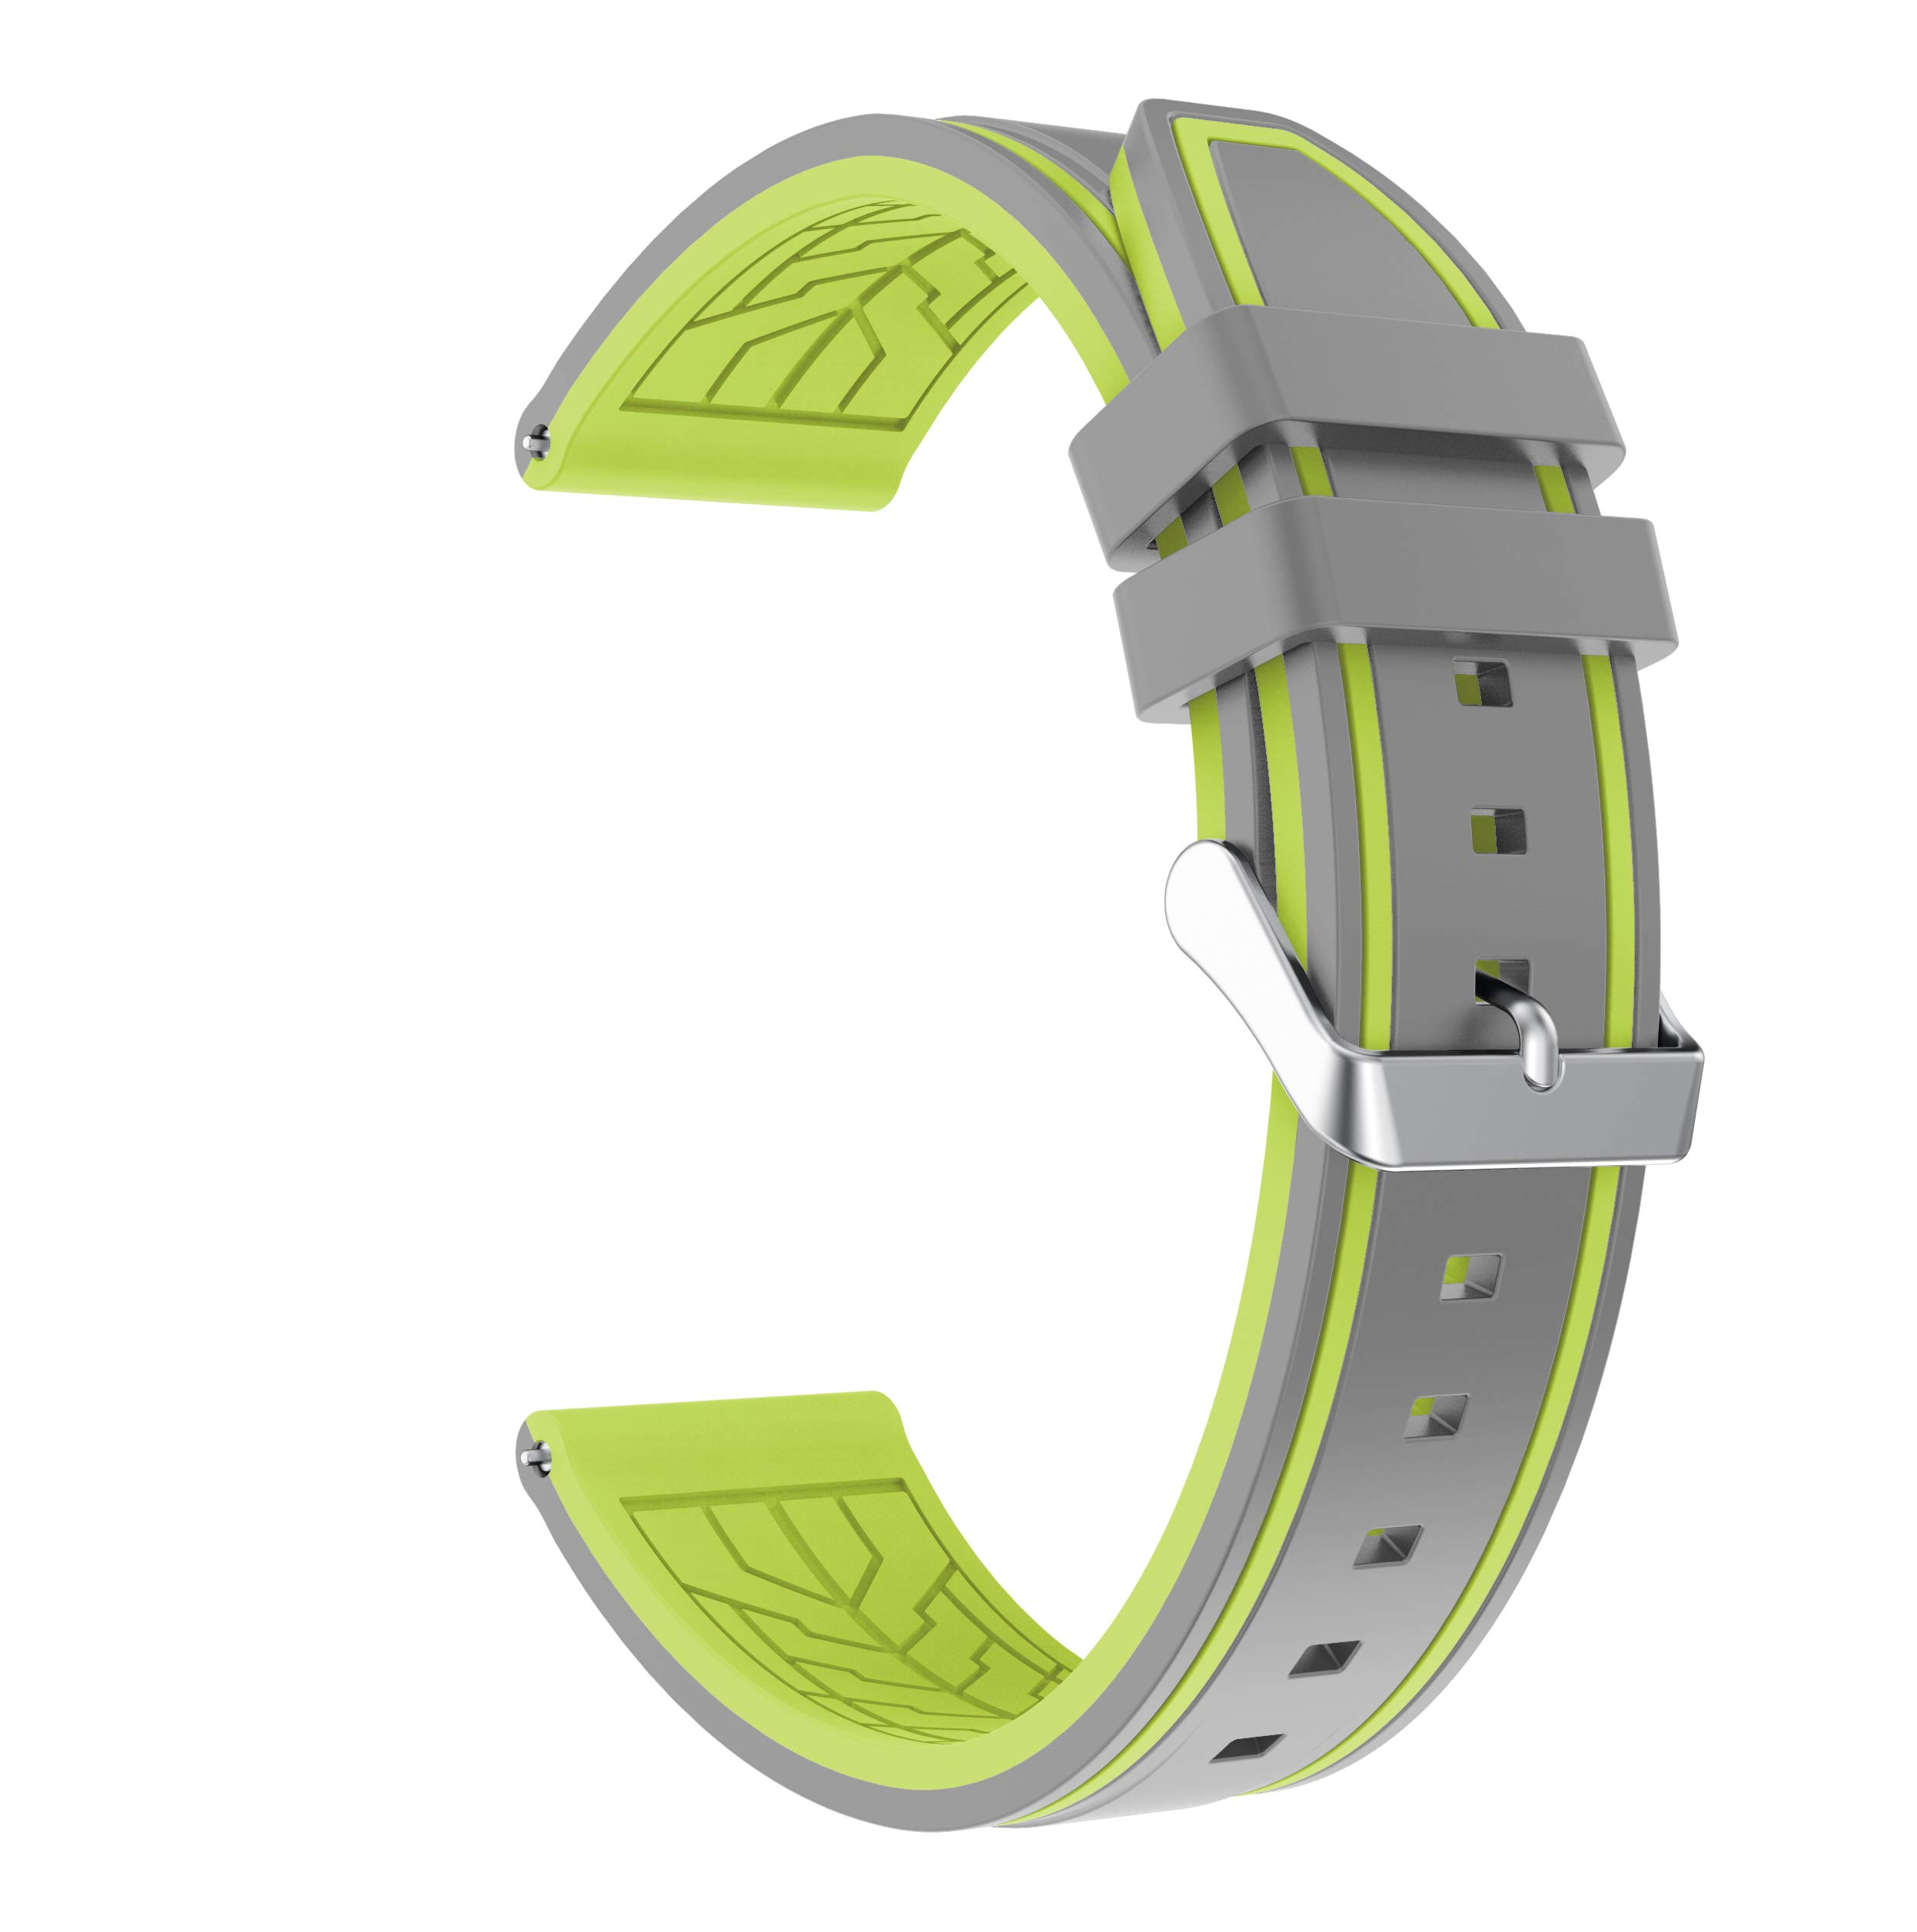 Fmway-22mm-Silikon-Uhrenband-Ersatzarmband-mit-Edelstahl-Metall-Schliee-fr-Samsung-Galaxy-Watch-46mm-Gear-S3-FrontierGear-S3-ClassicMoto-360-2-Generation-46mm-Amazfit